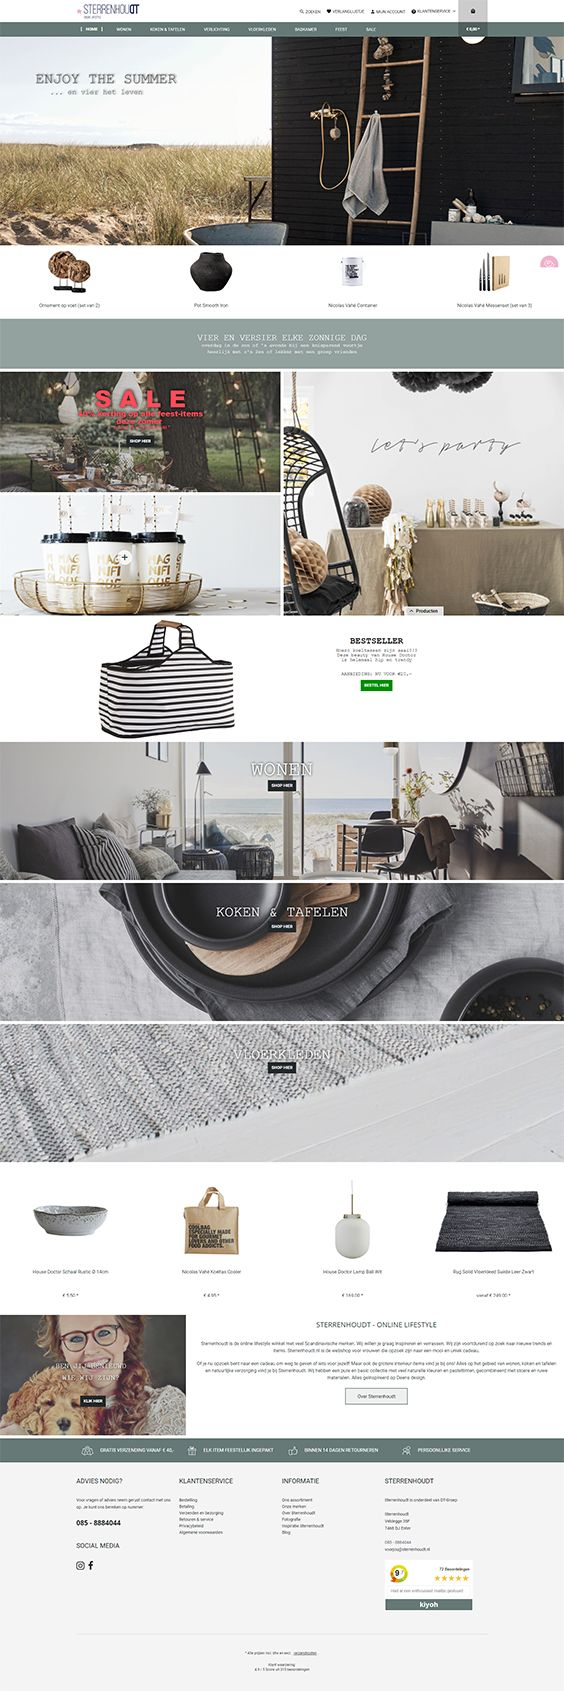 Shopware Design, Shopware Theme, Shopware Shop, eCommerce, eCommerce Software, eCommerce platform, Onlineshop, Interior Design, Decoration, Dutch Design, Dutch Lifestyle